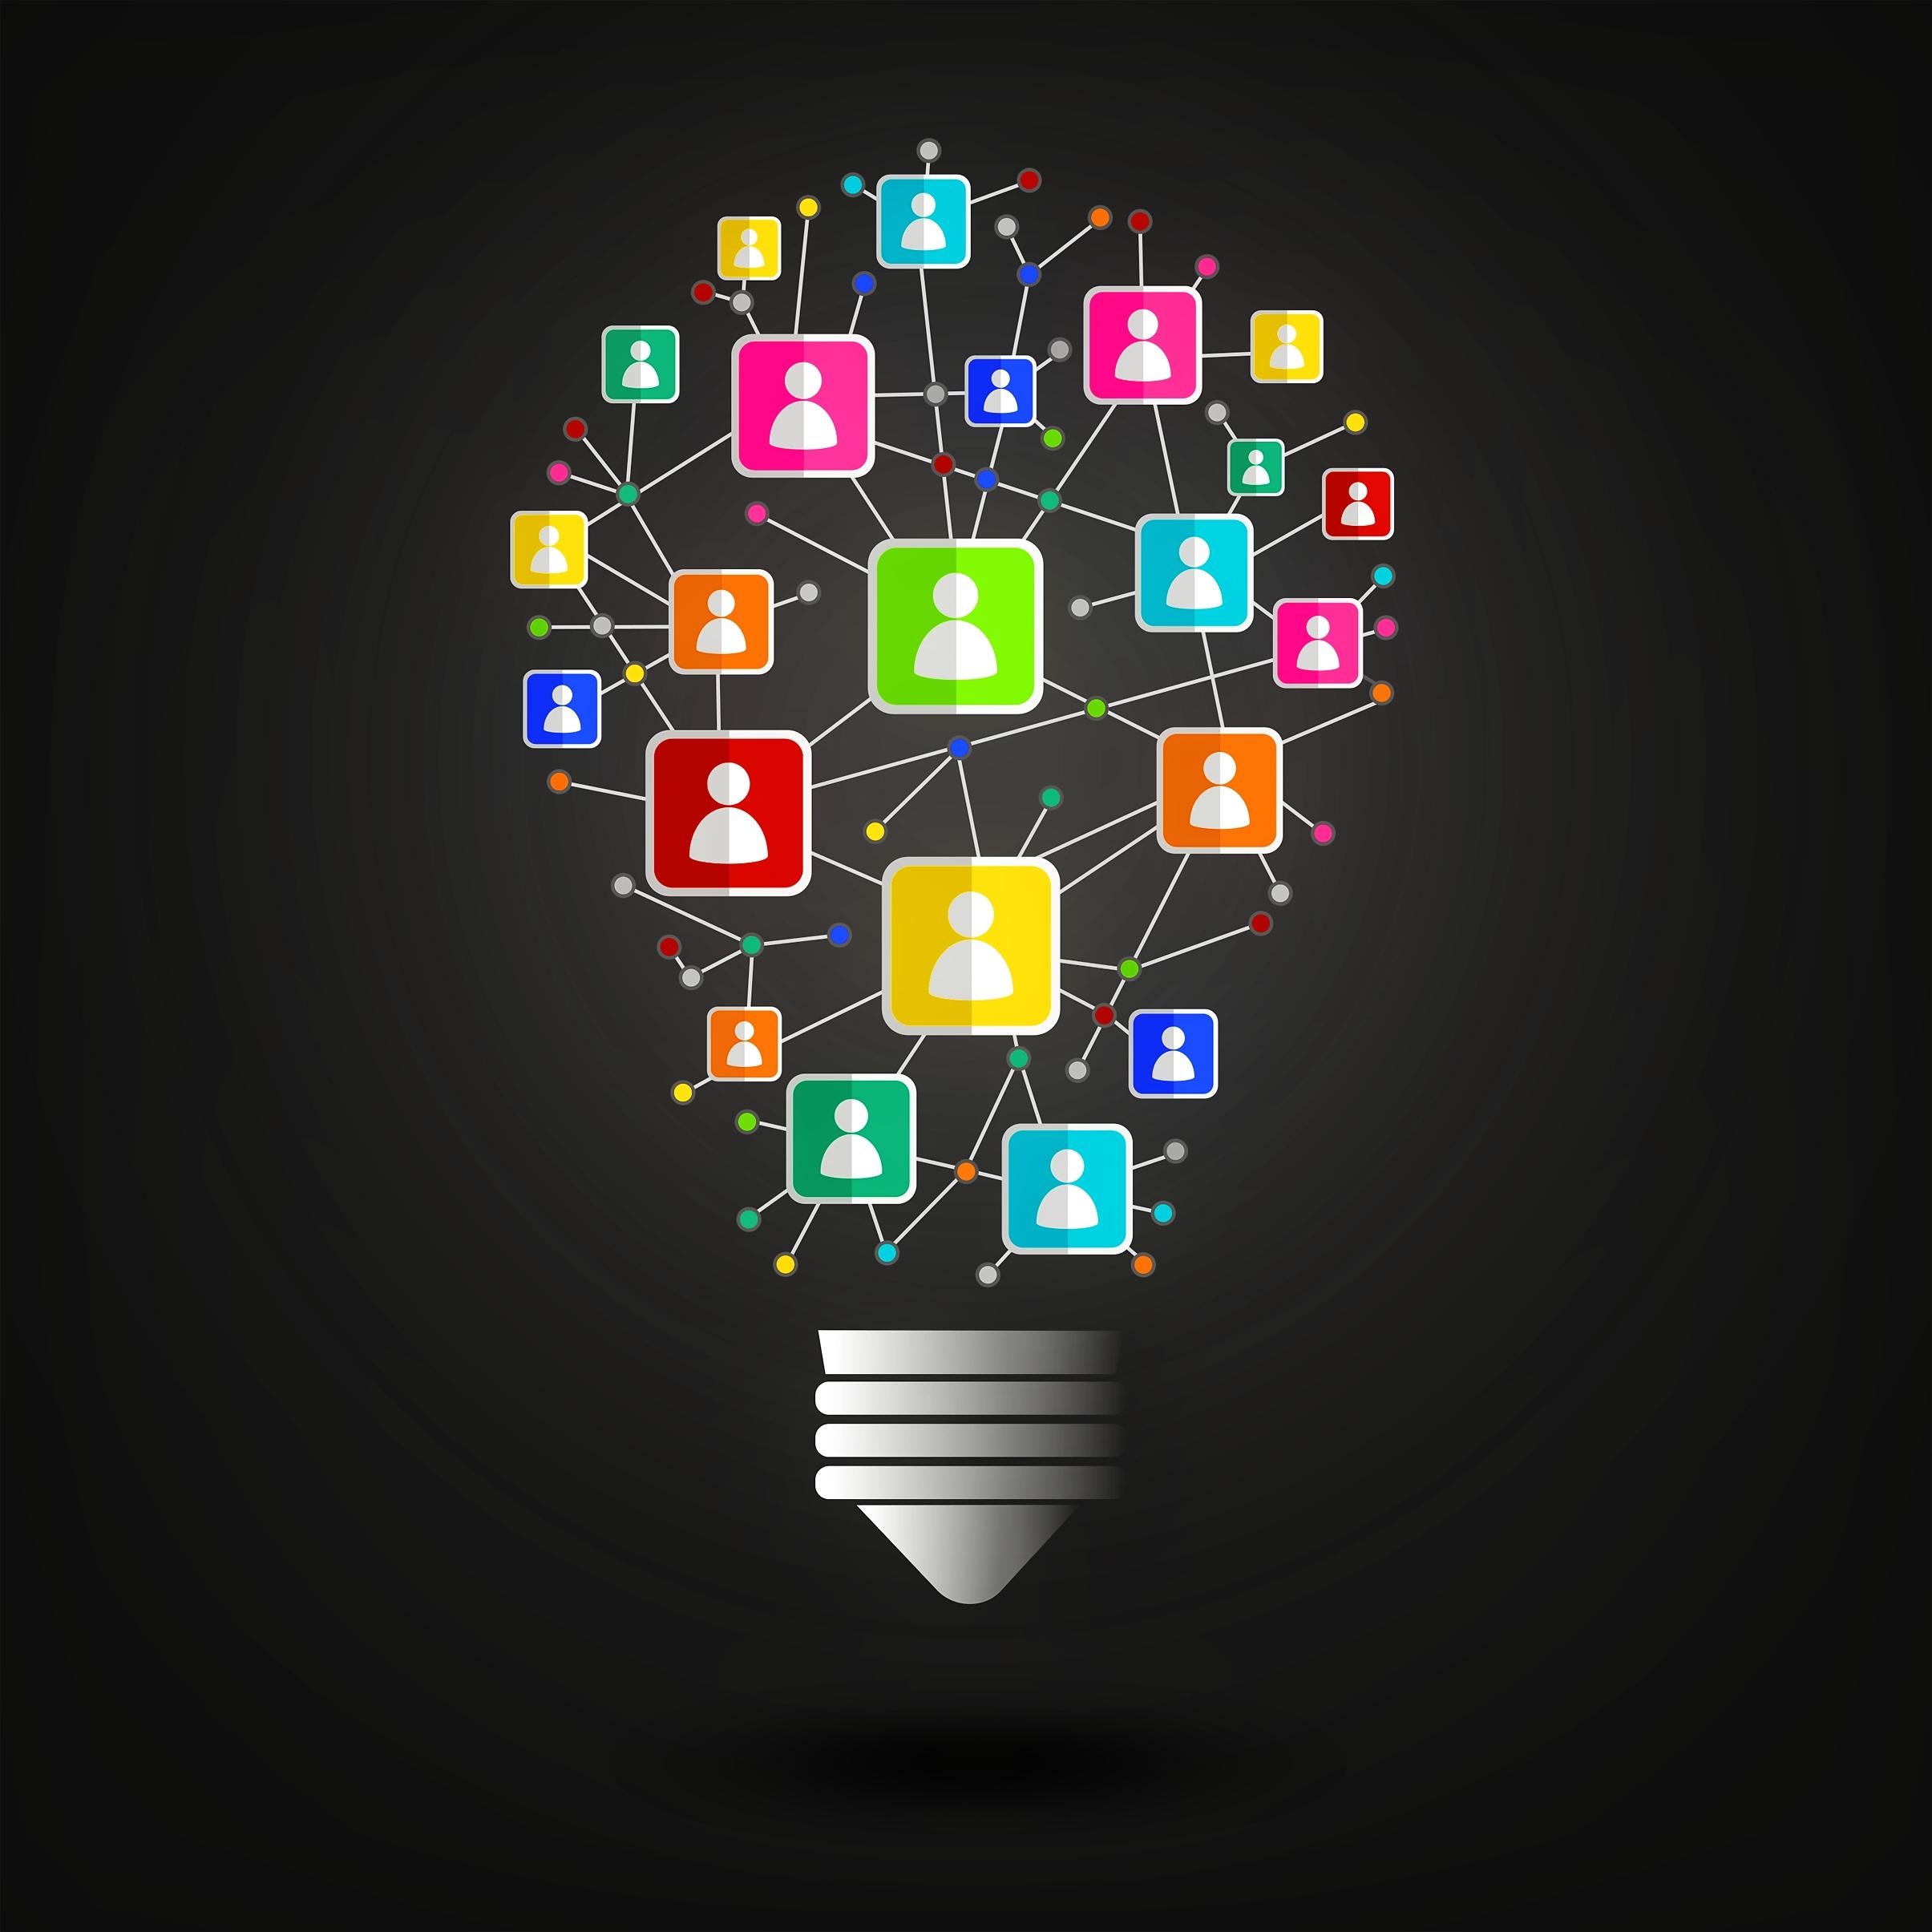 Networking Idea with Lightbulb, New, Presentation, Polygonal, Polygon, HQ Photo